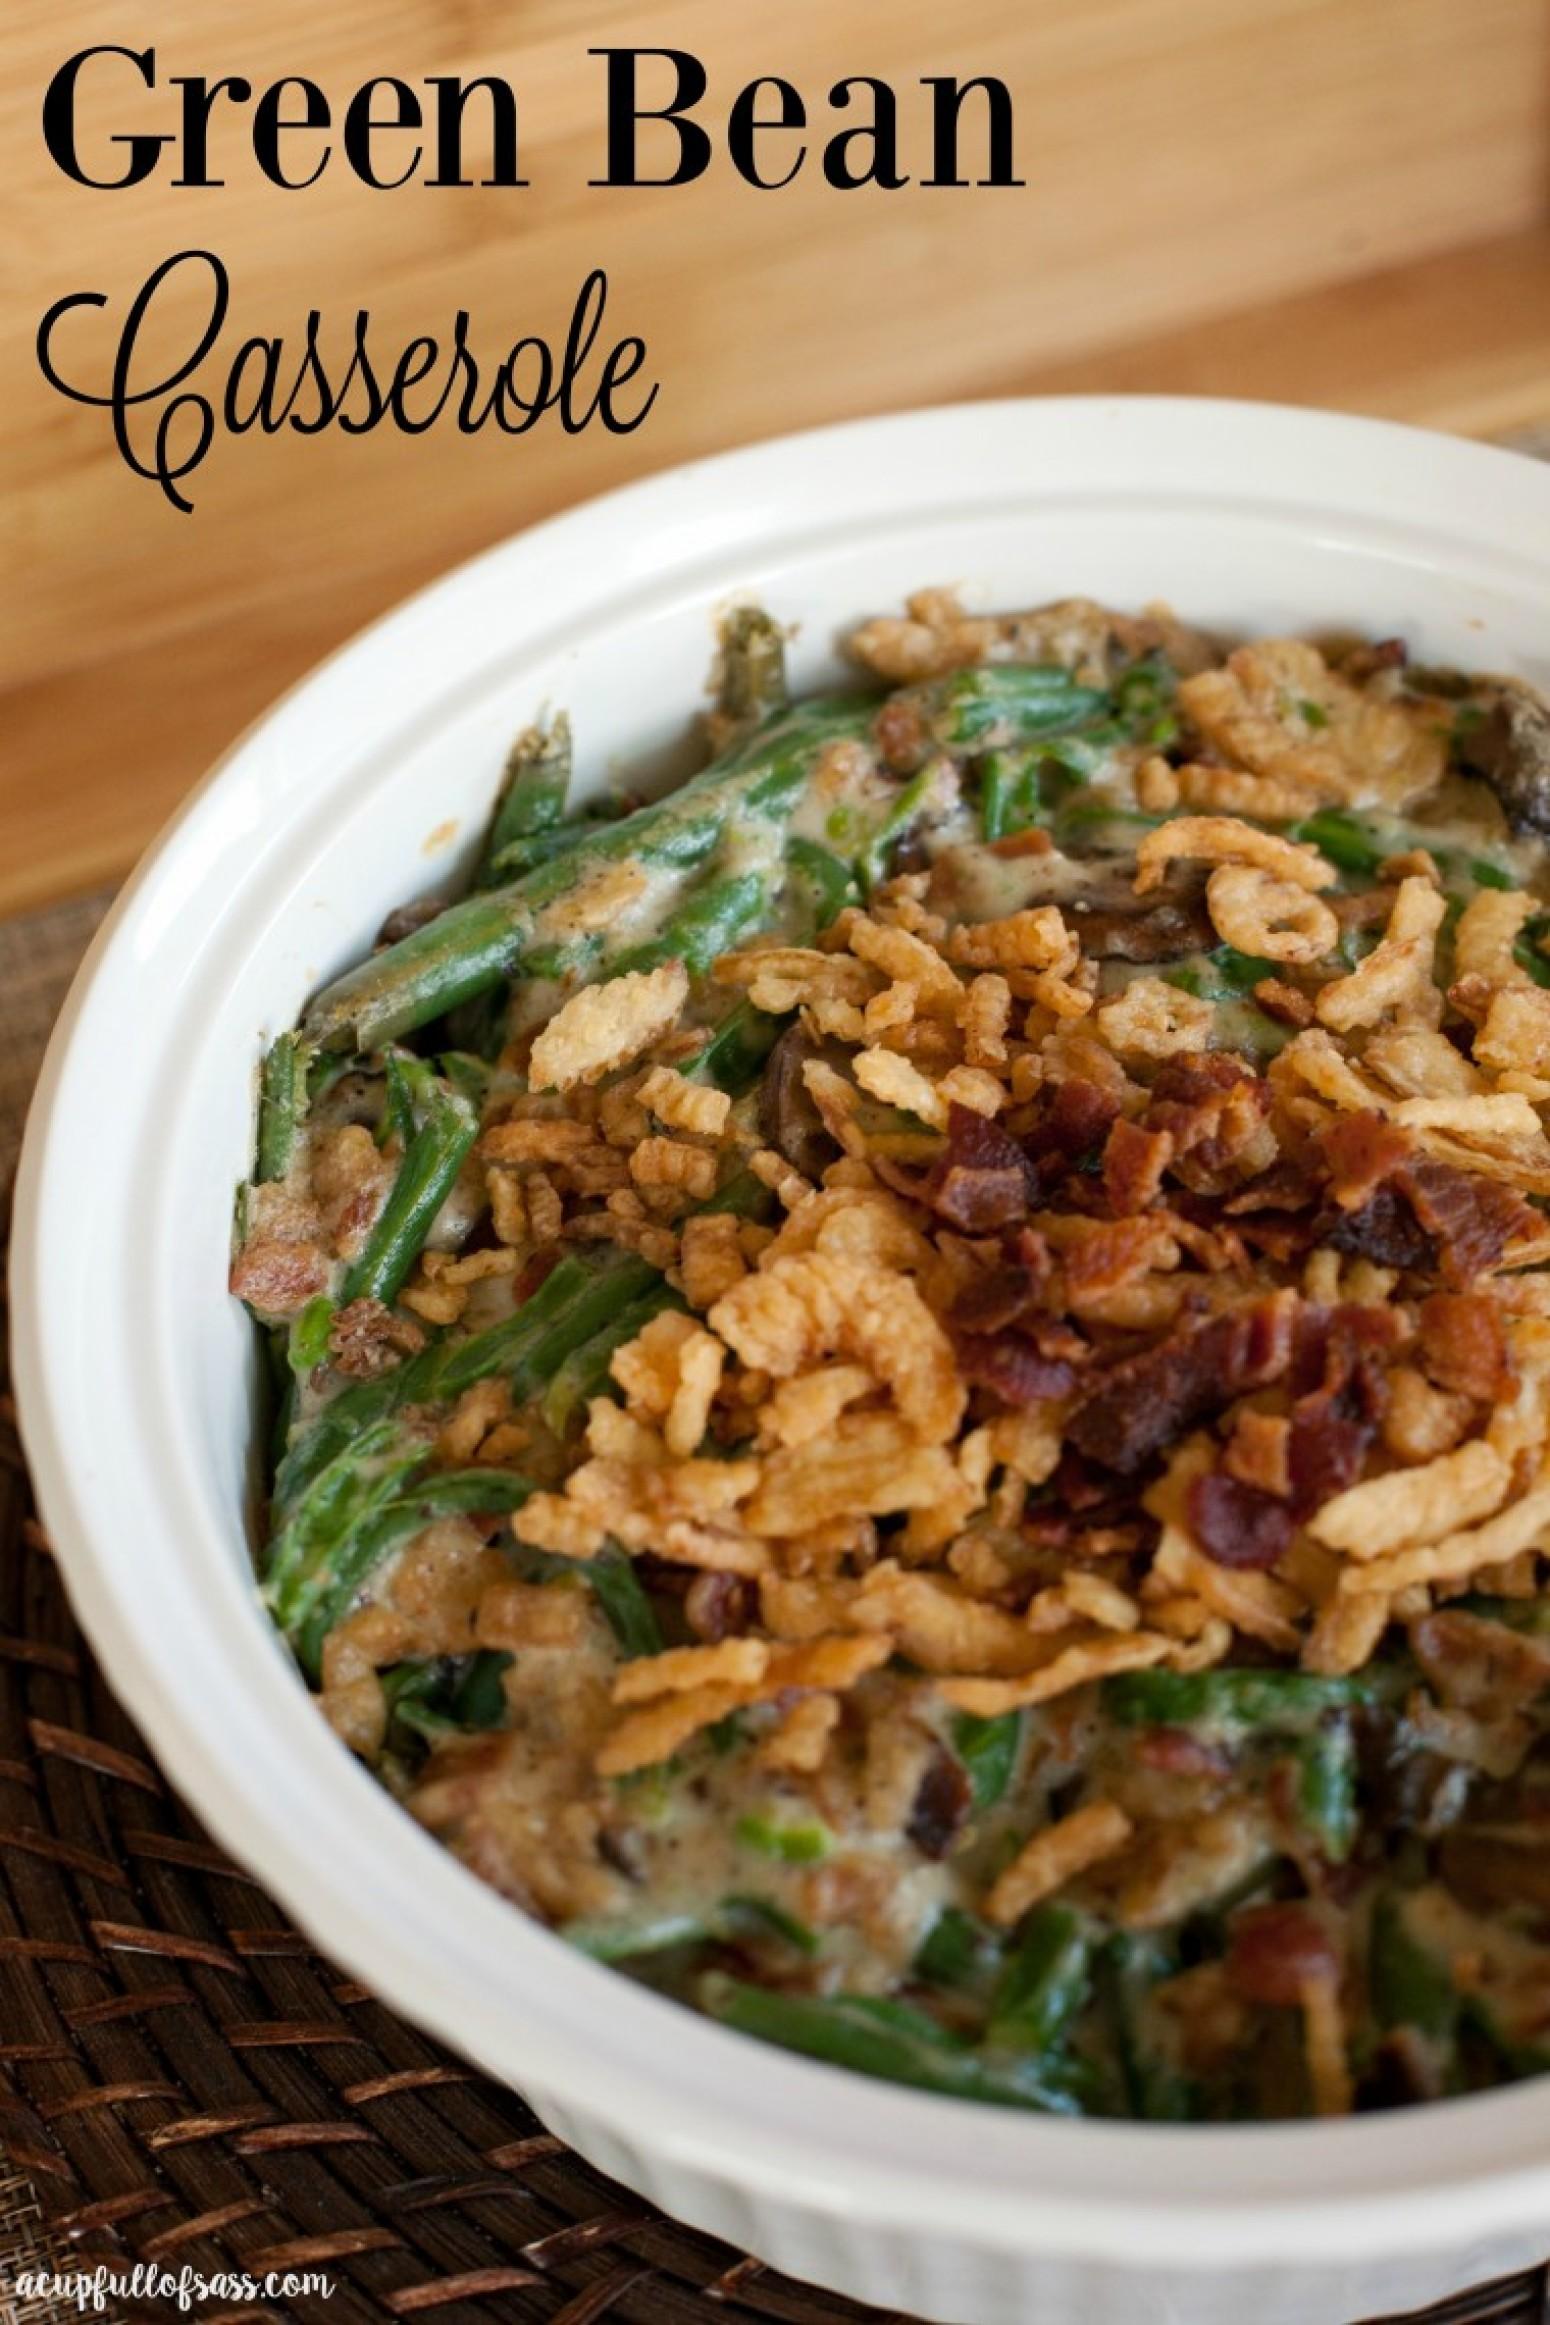 Green Bean Casserole Recipe 27 | Just A Pinch Recipes